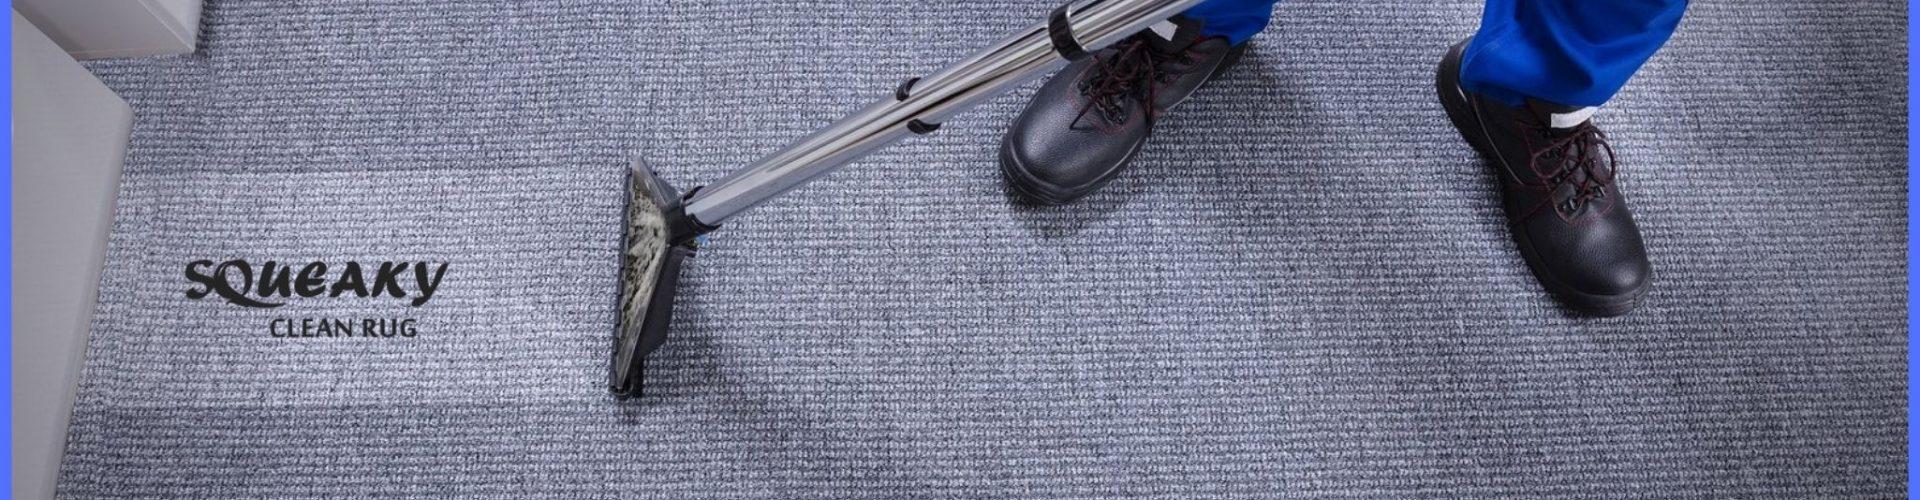 Carpet & Rug Cleaning Hobart